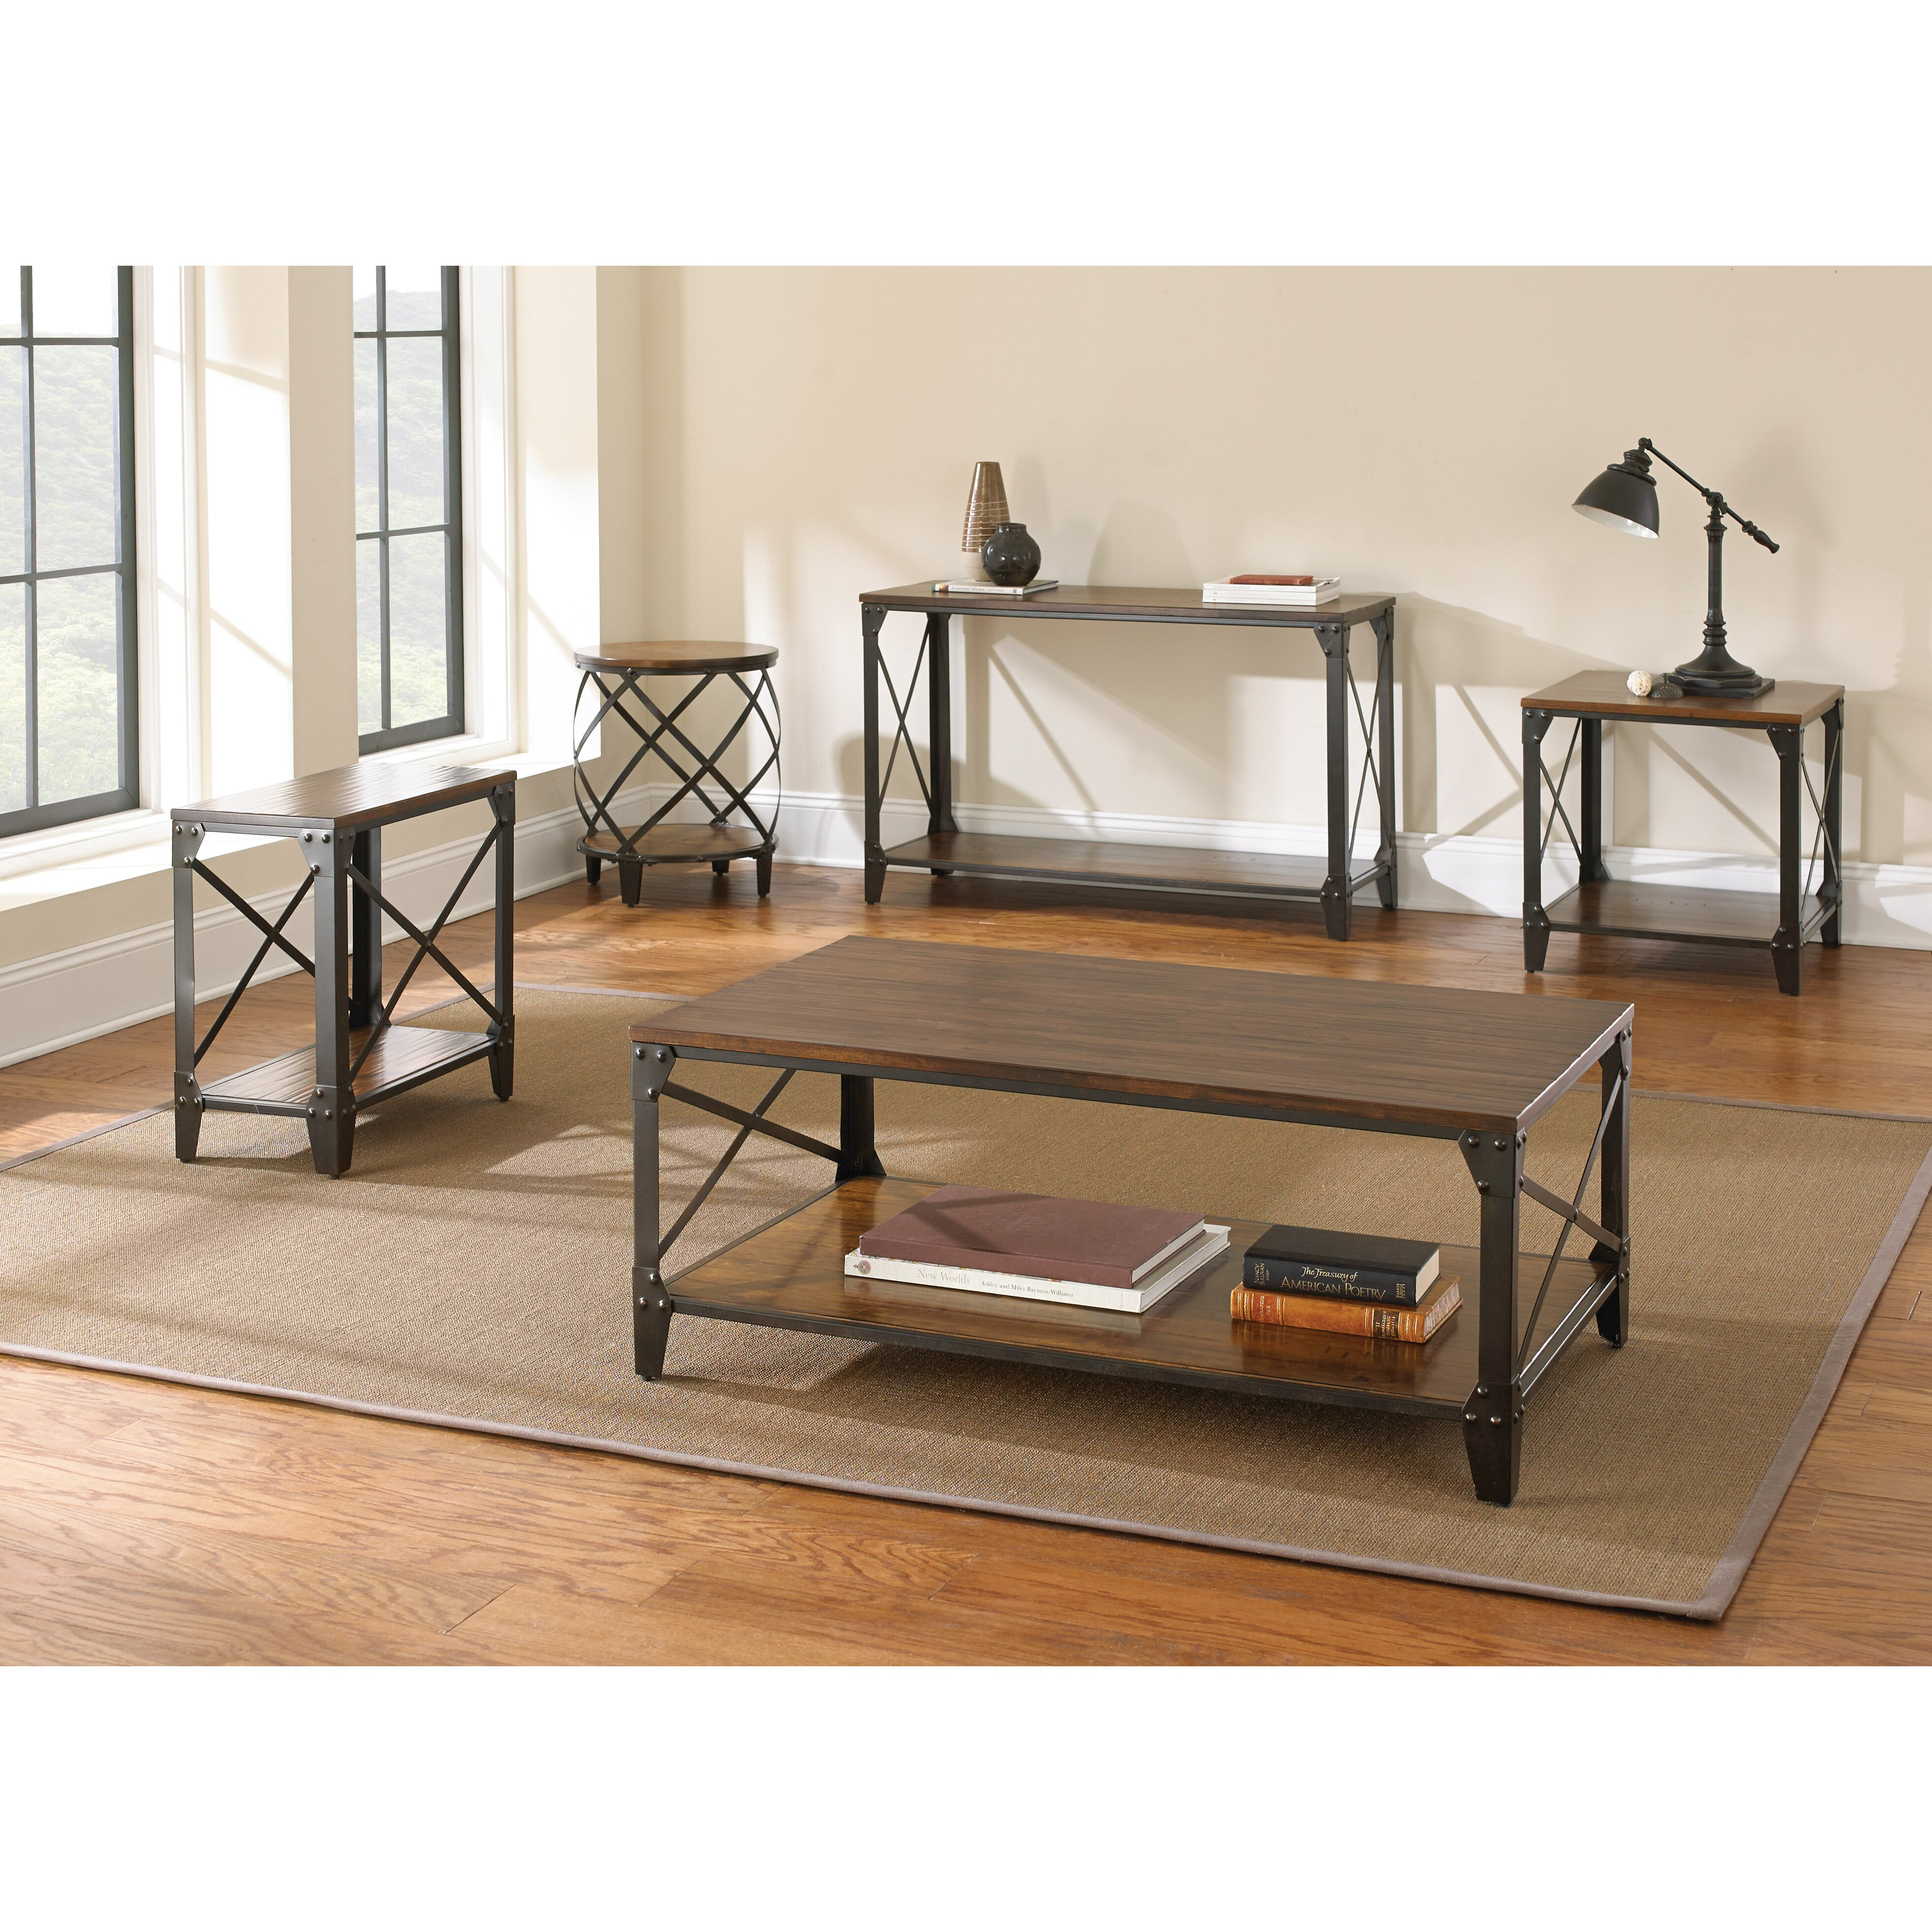 Trent Austin Design Laguna Coffee Table Reviews: Trent Austin Design Lawrenceville Coffee Table & Reviews